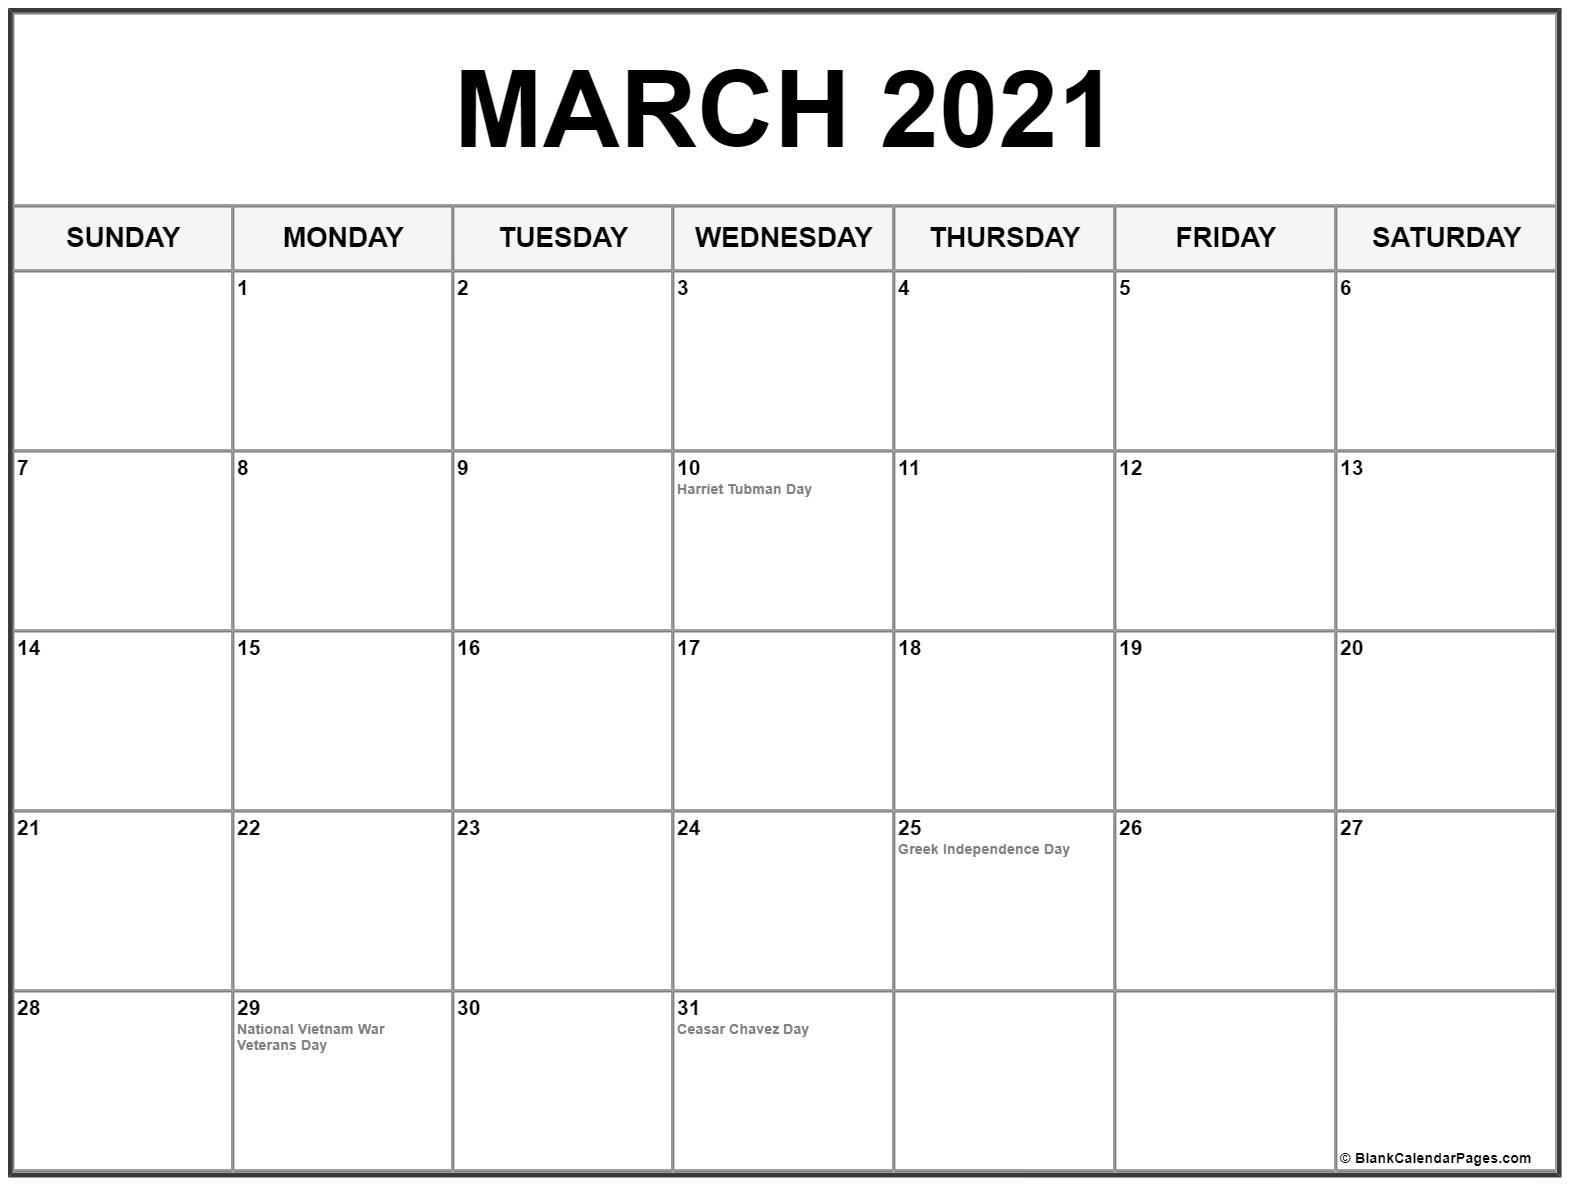 March 2021 US Holidays Calendar